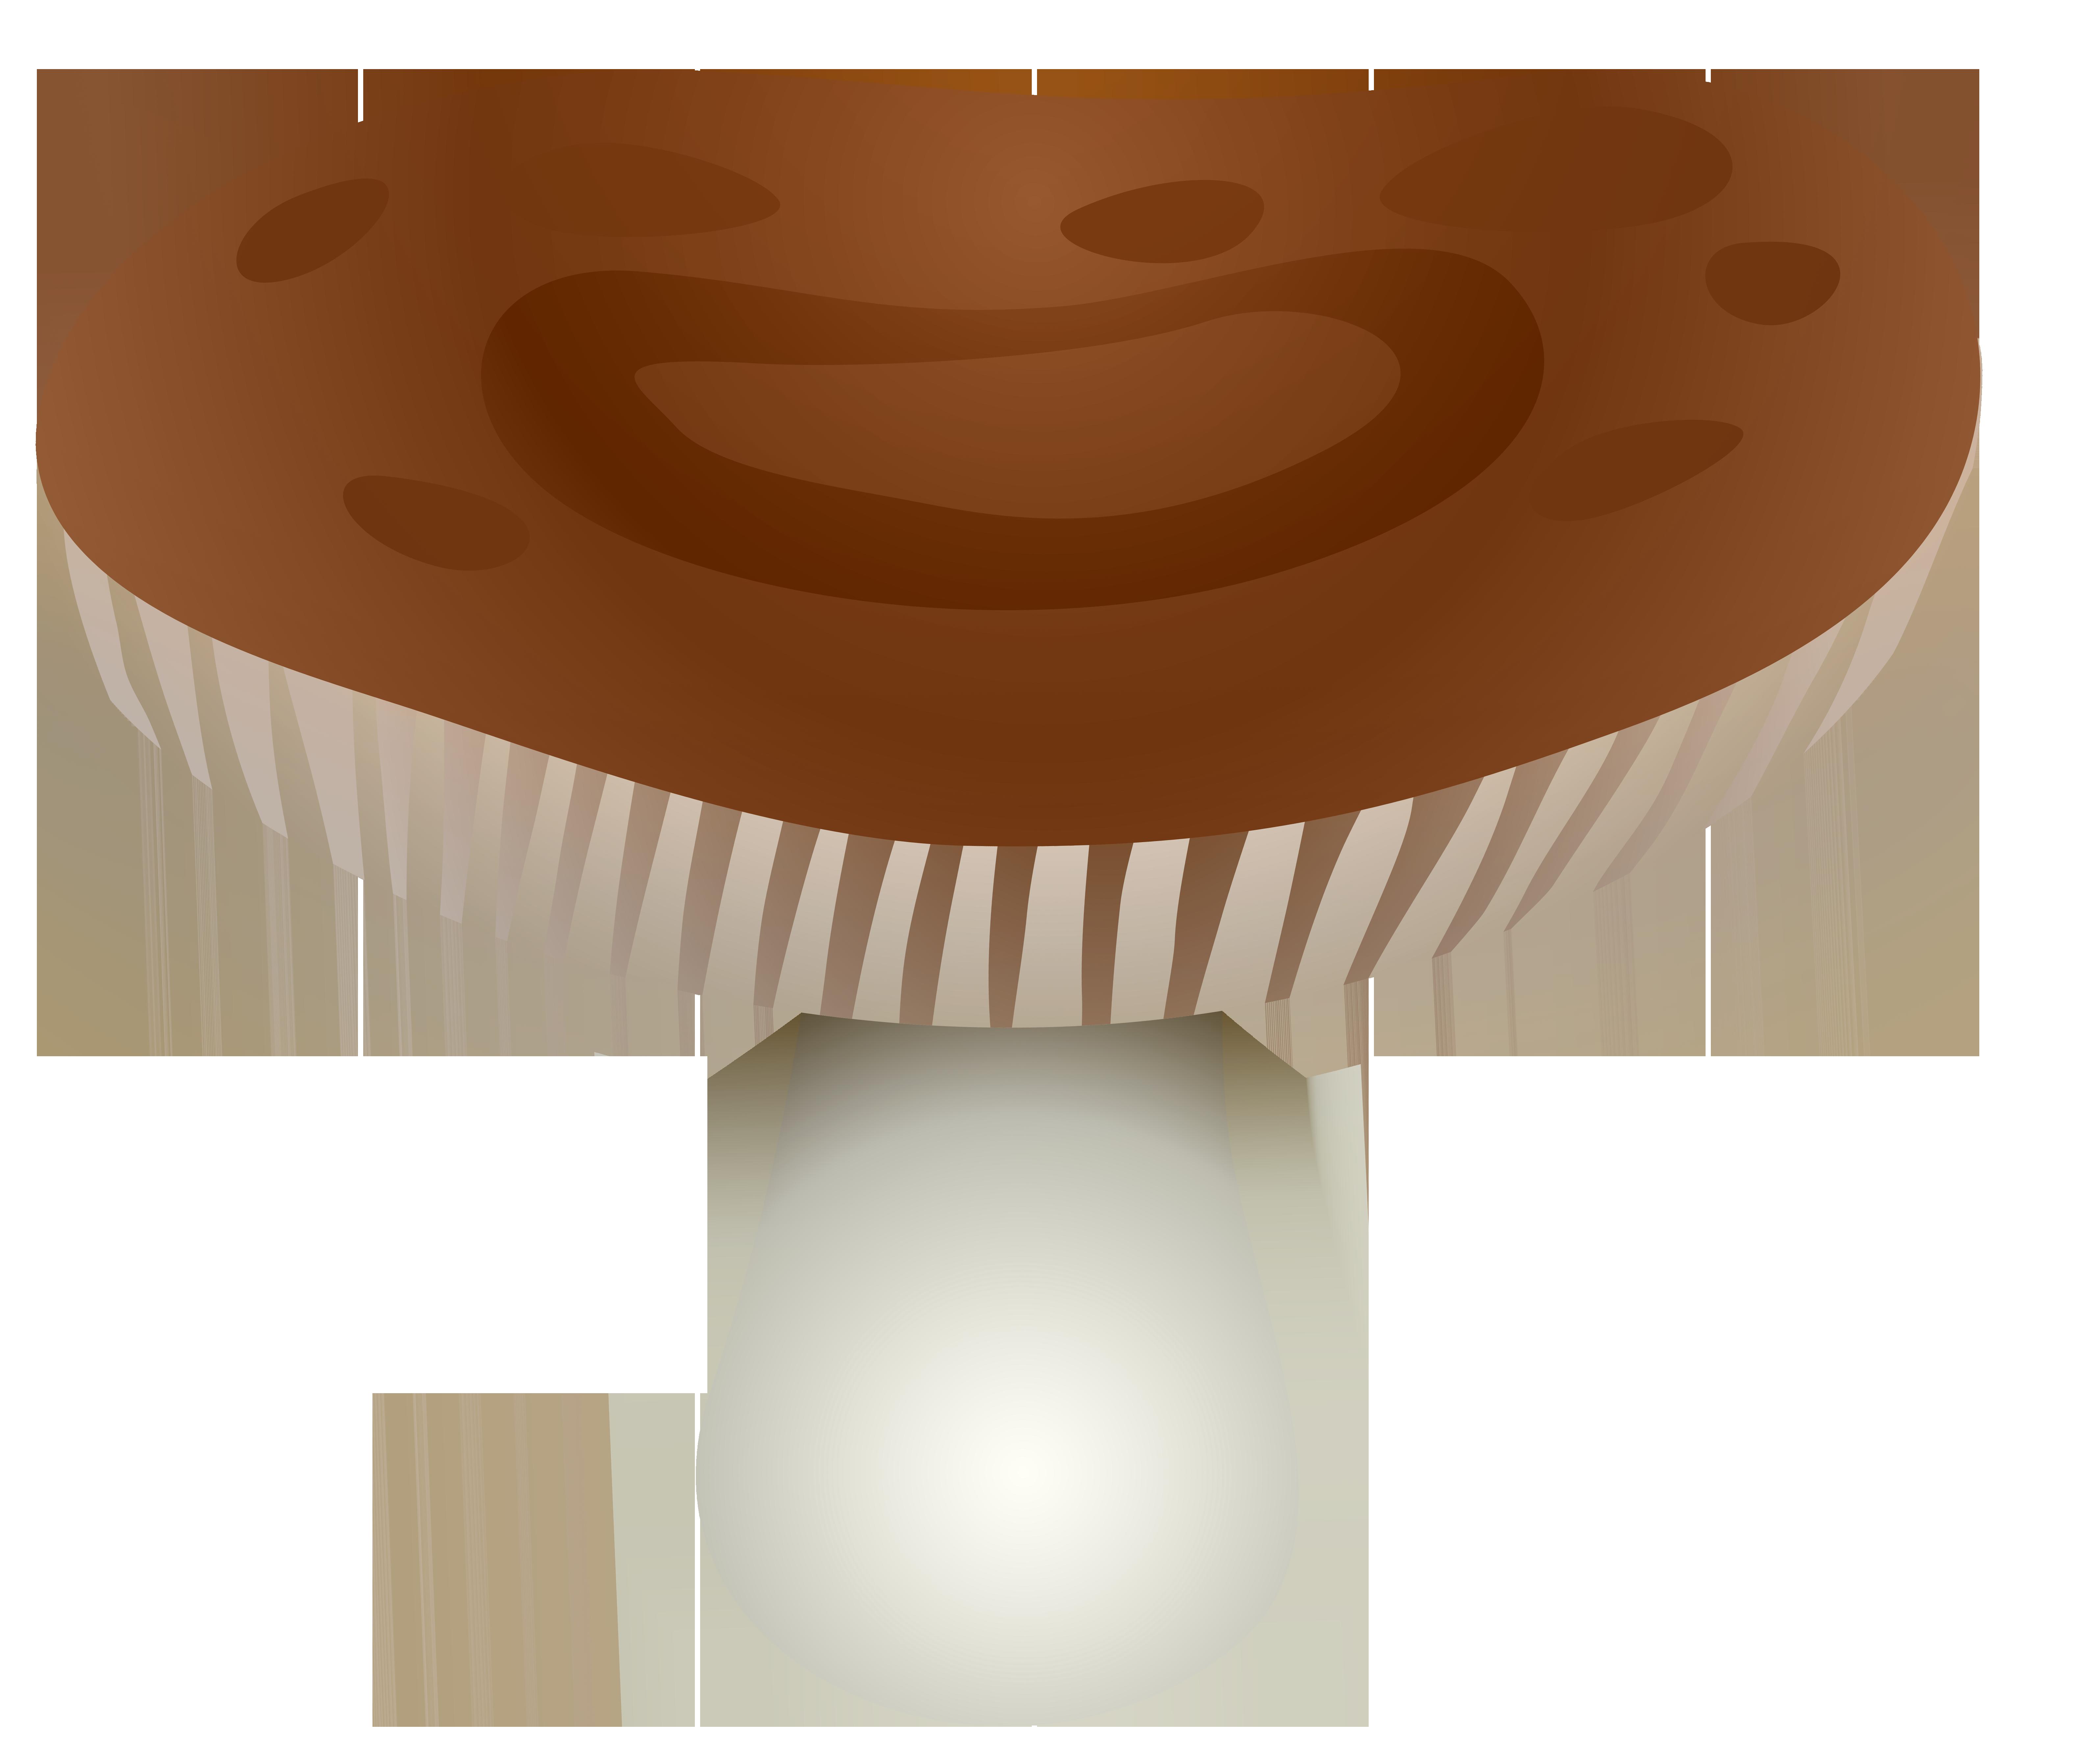 Mushrooms clipart mushroom vegetable. Brown transparent png best